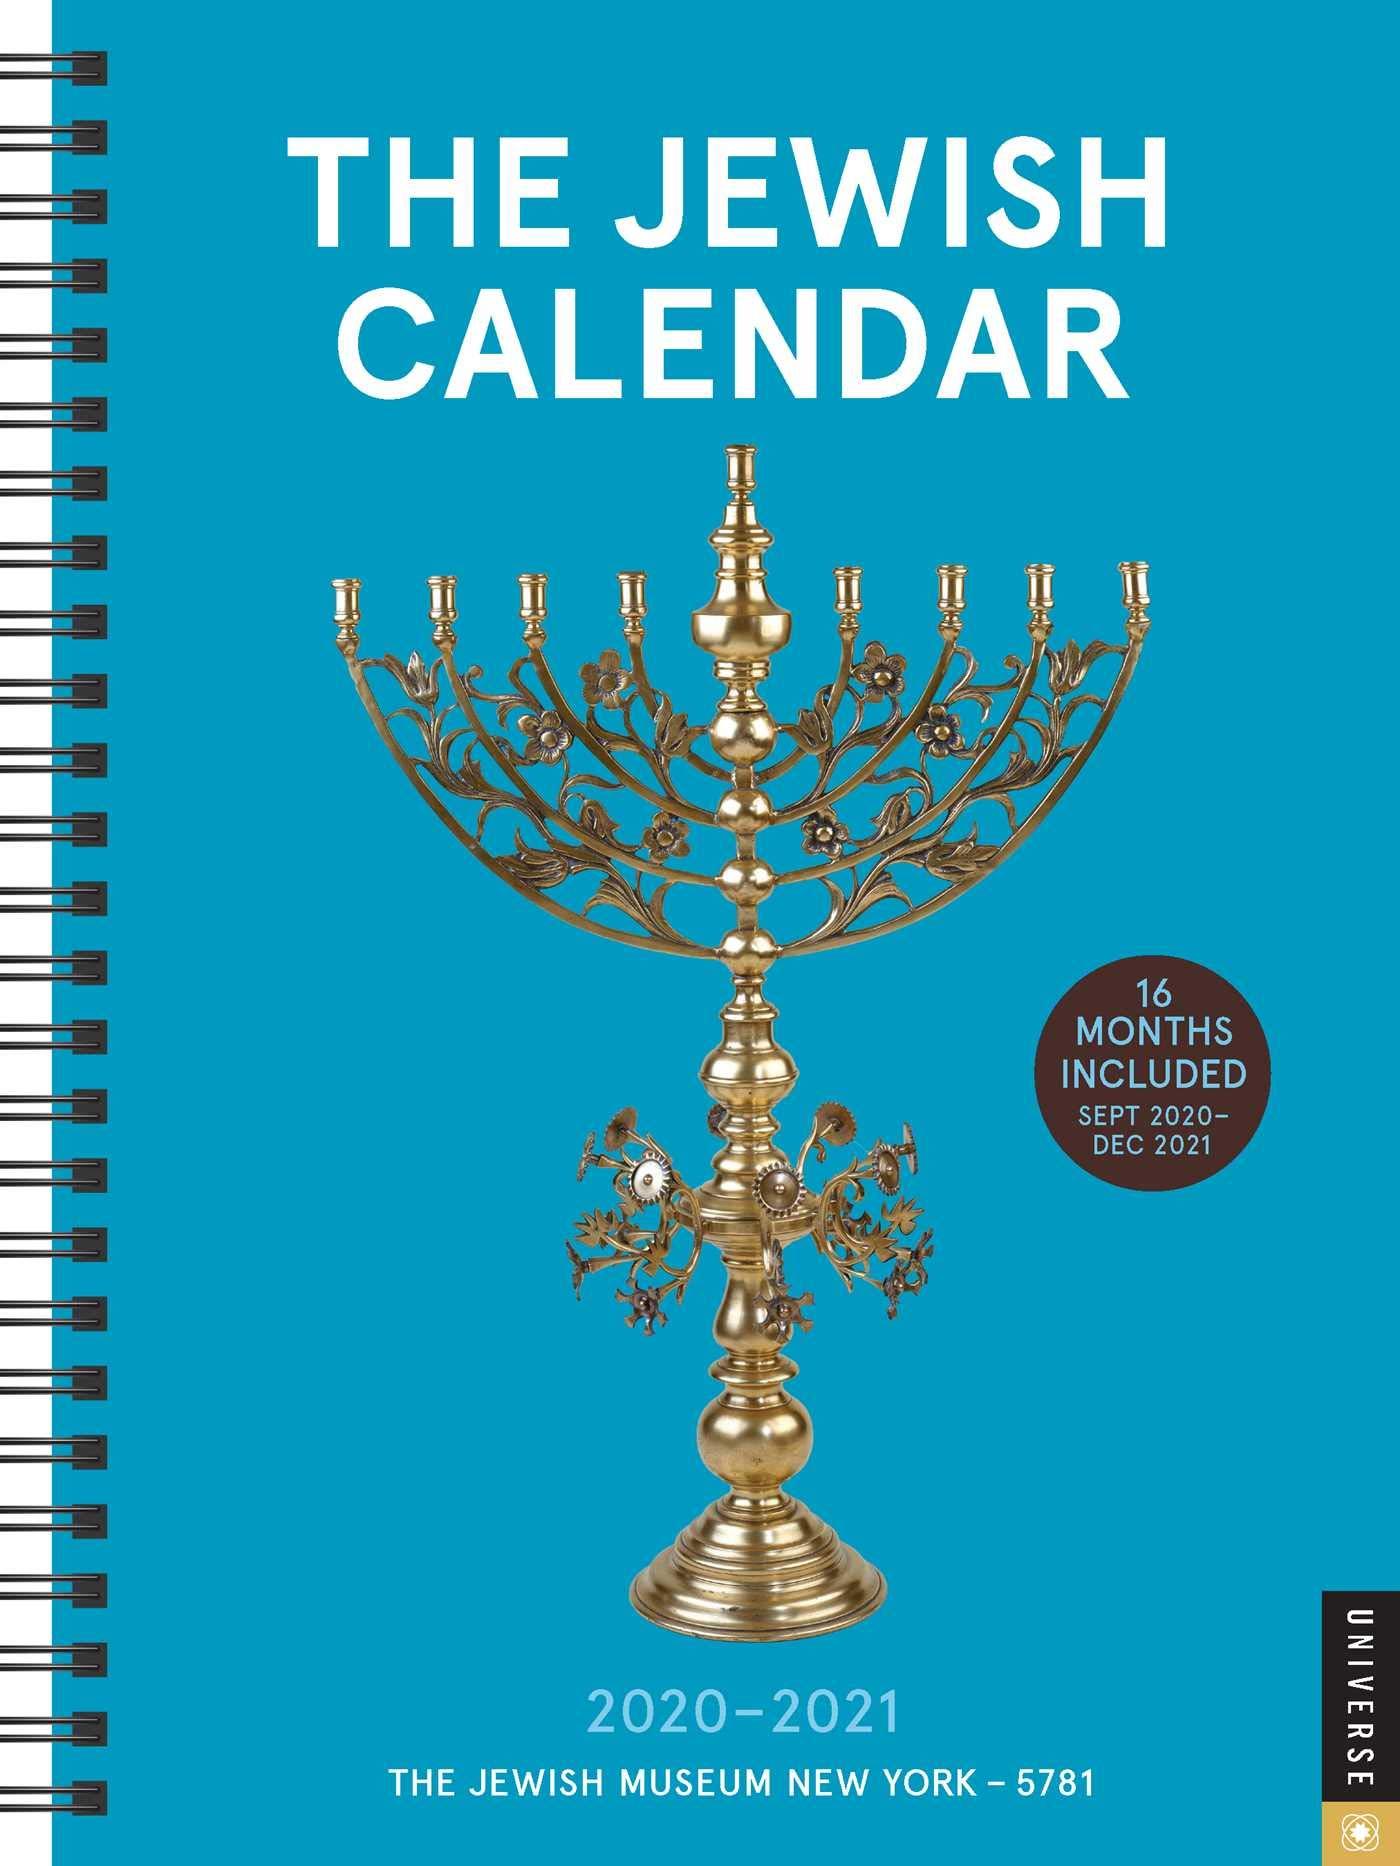 Hebrew Calendar 2021 The Jewish Calendar 16 Month 2020 2021 Engagement Calendar: Jewish